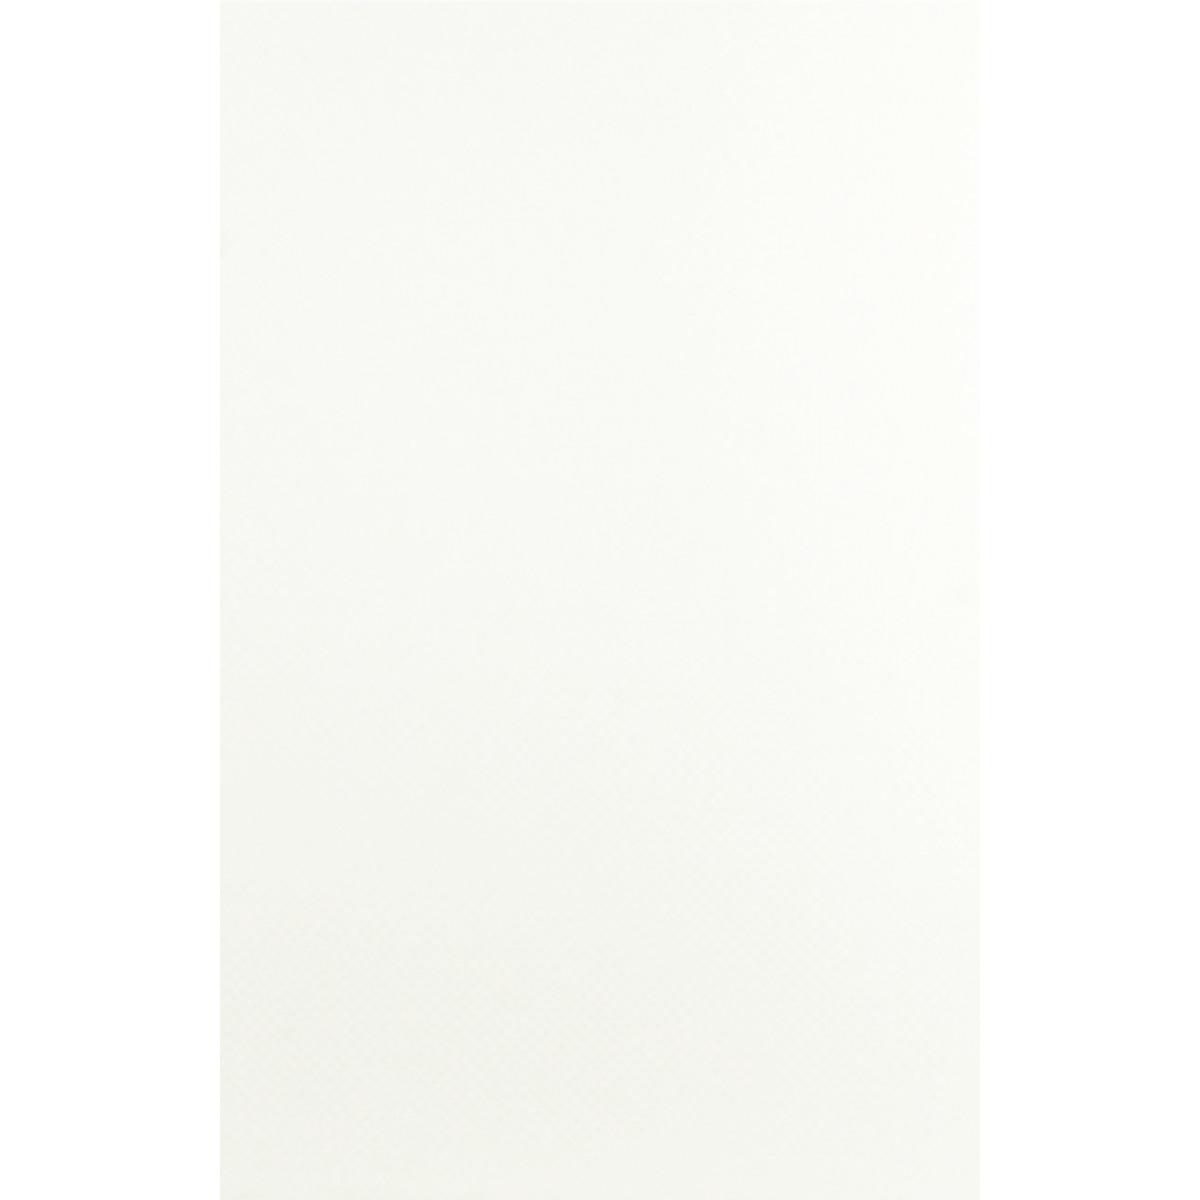 Плитка настеннаяVual 20х30 см 1.08 м2 цвет белый